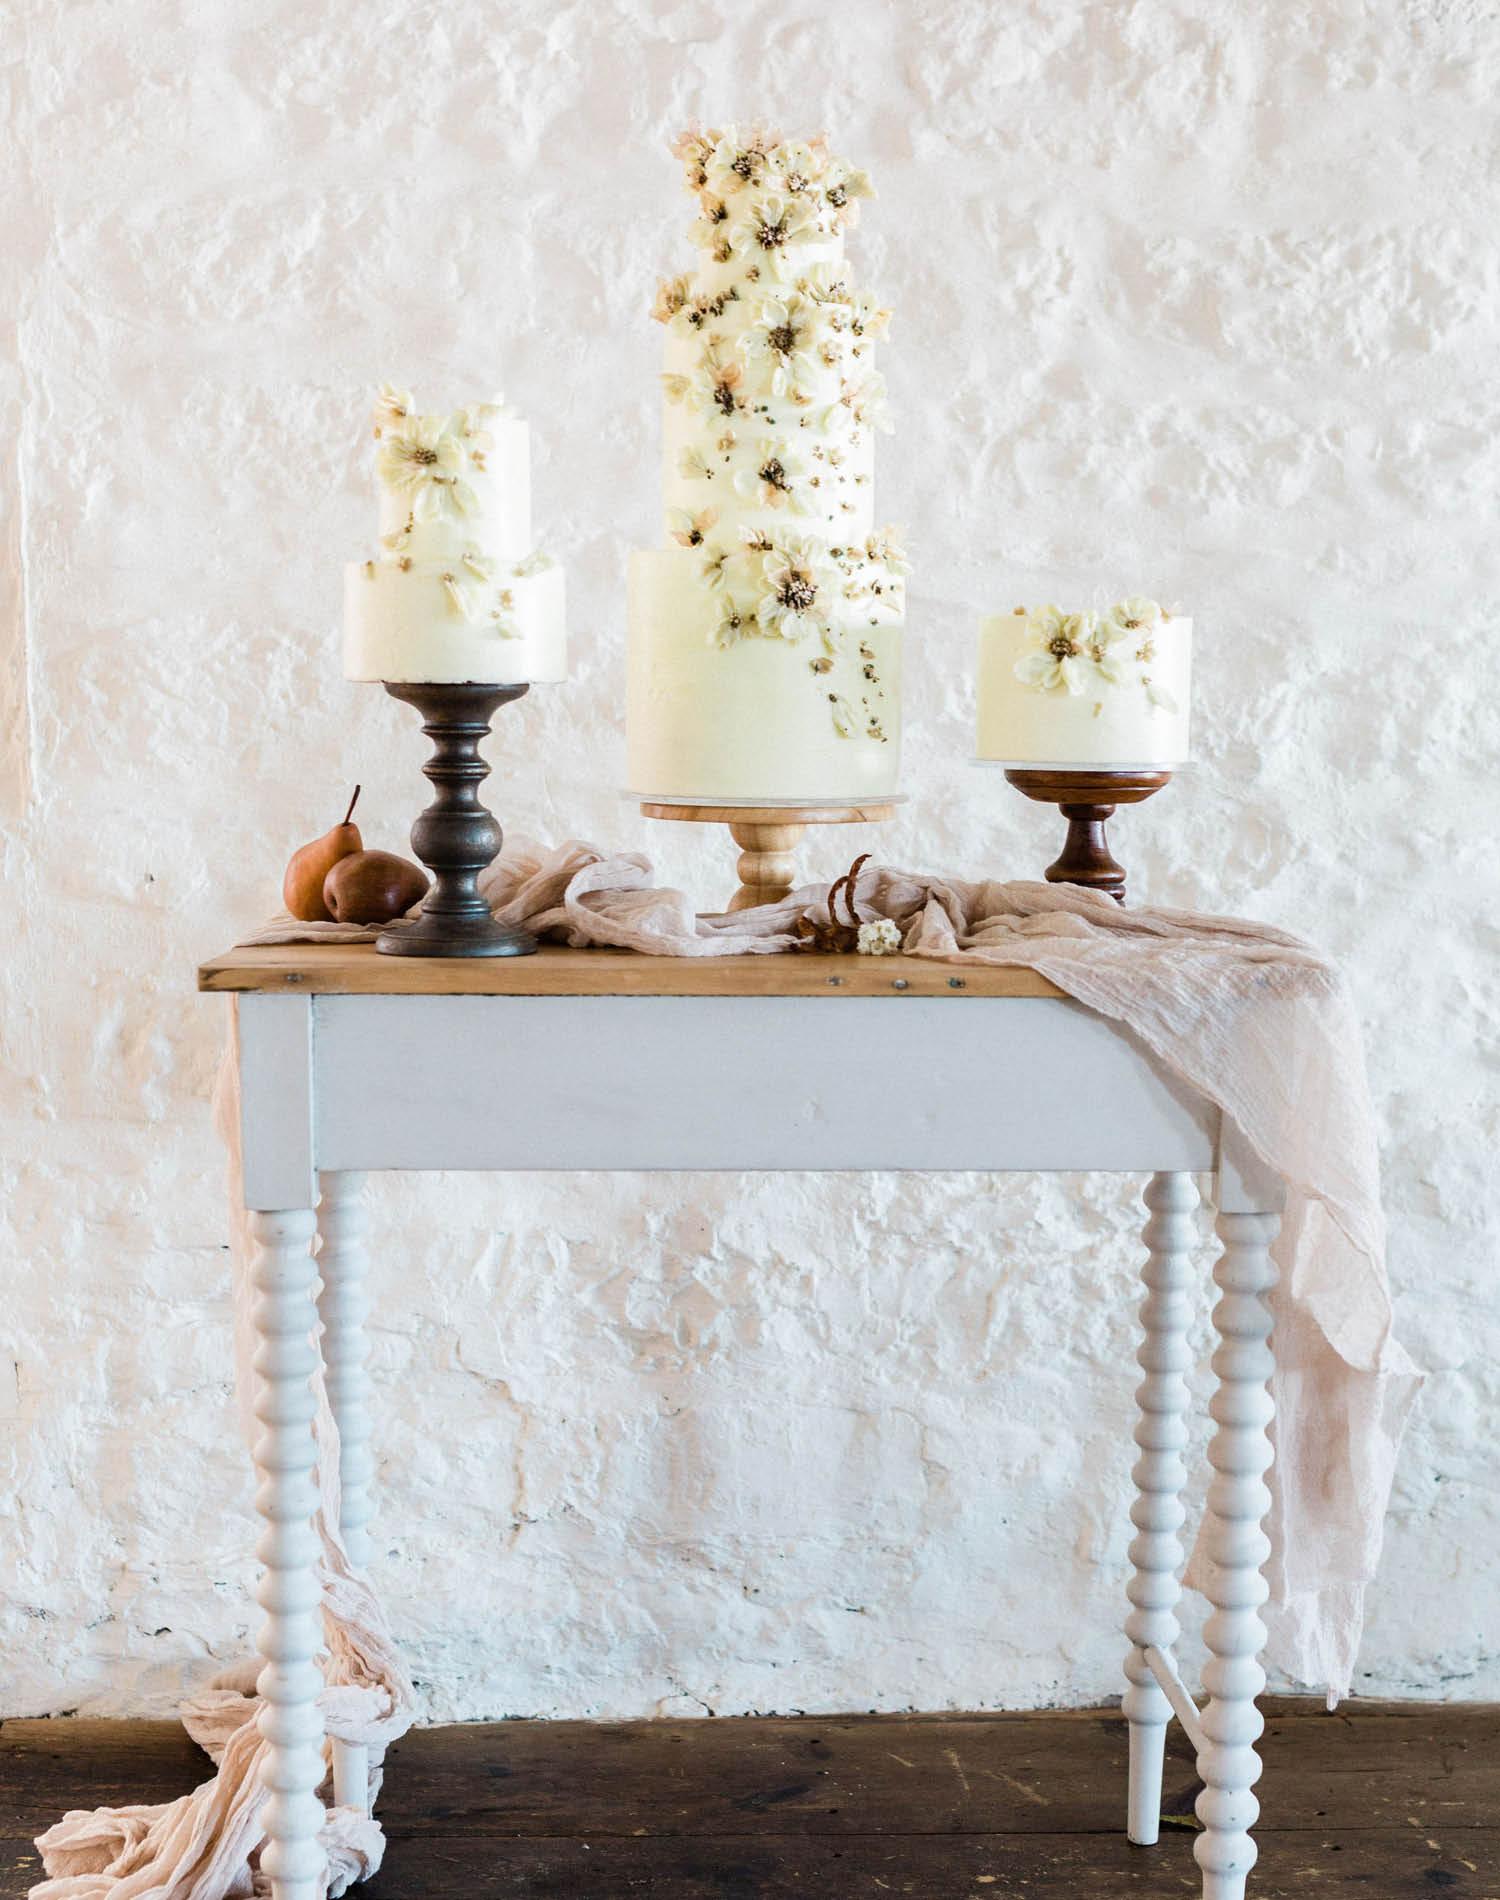 French Farm House Inspired Wedding in Quebec Auberge Saint-Antoine - Wedding Cake by Cynthia Irani Design